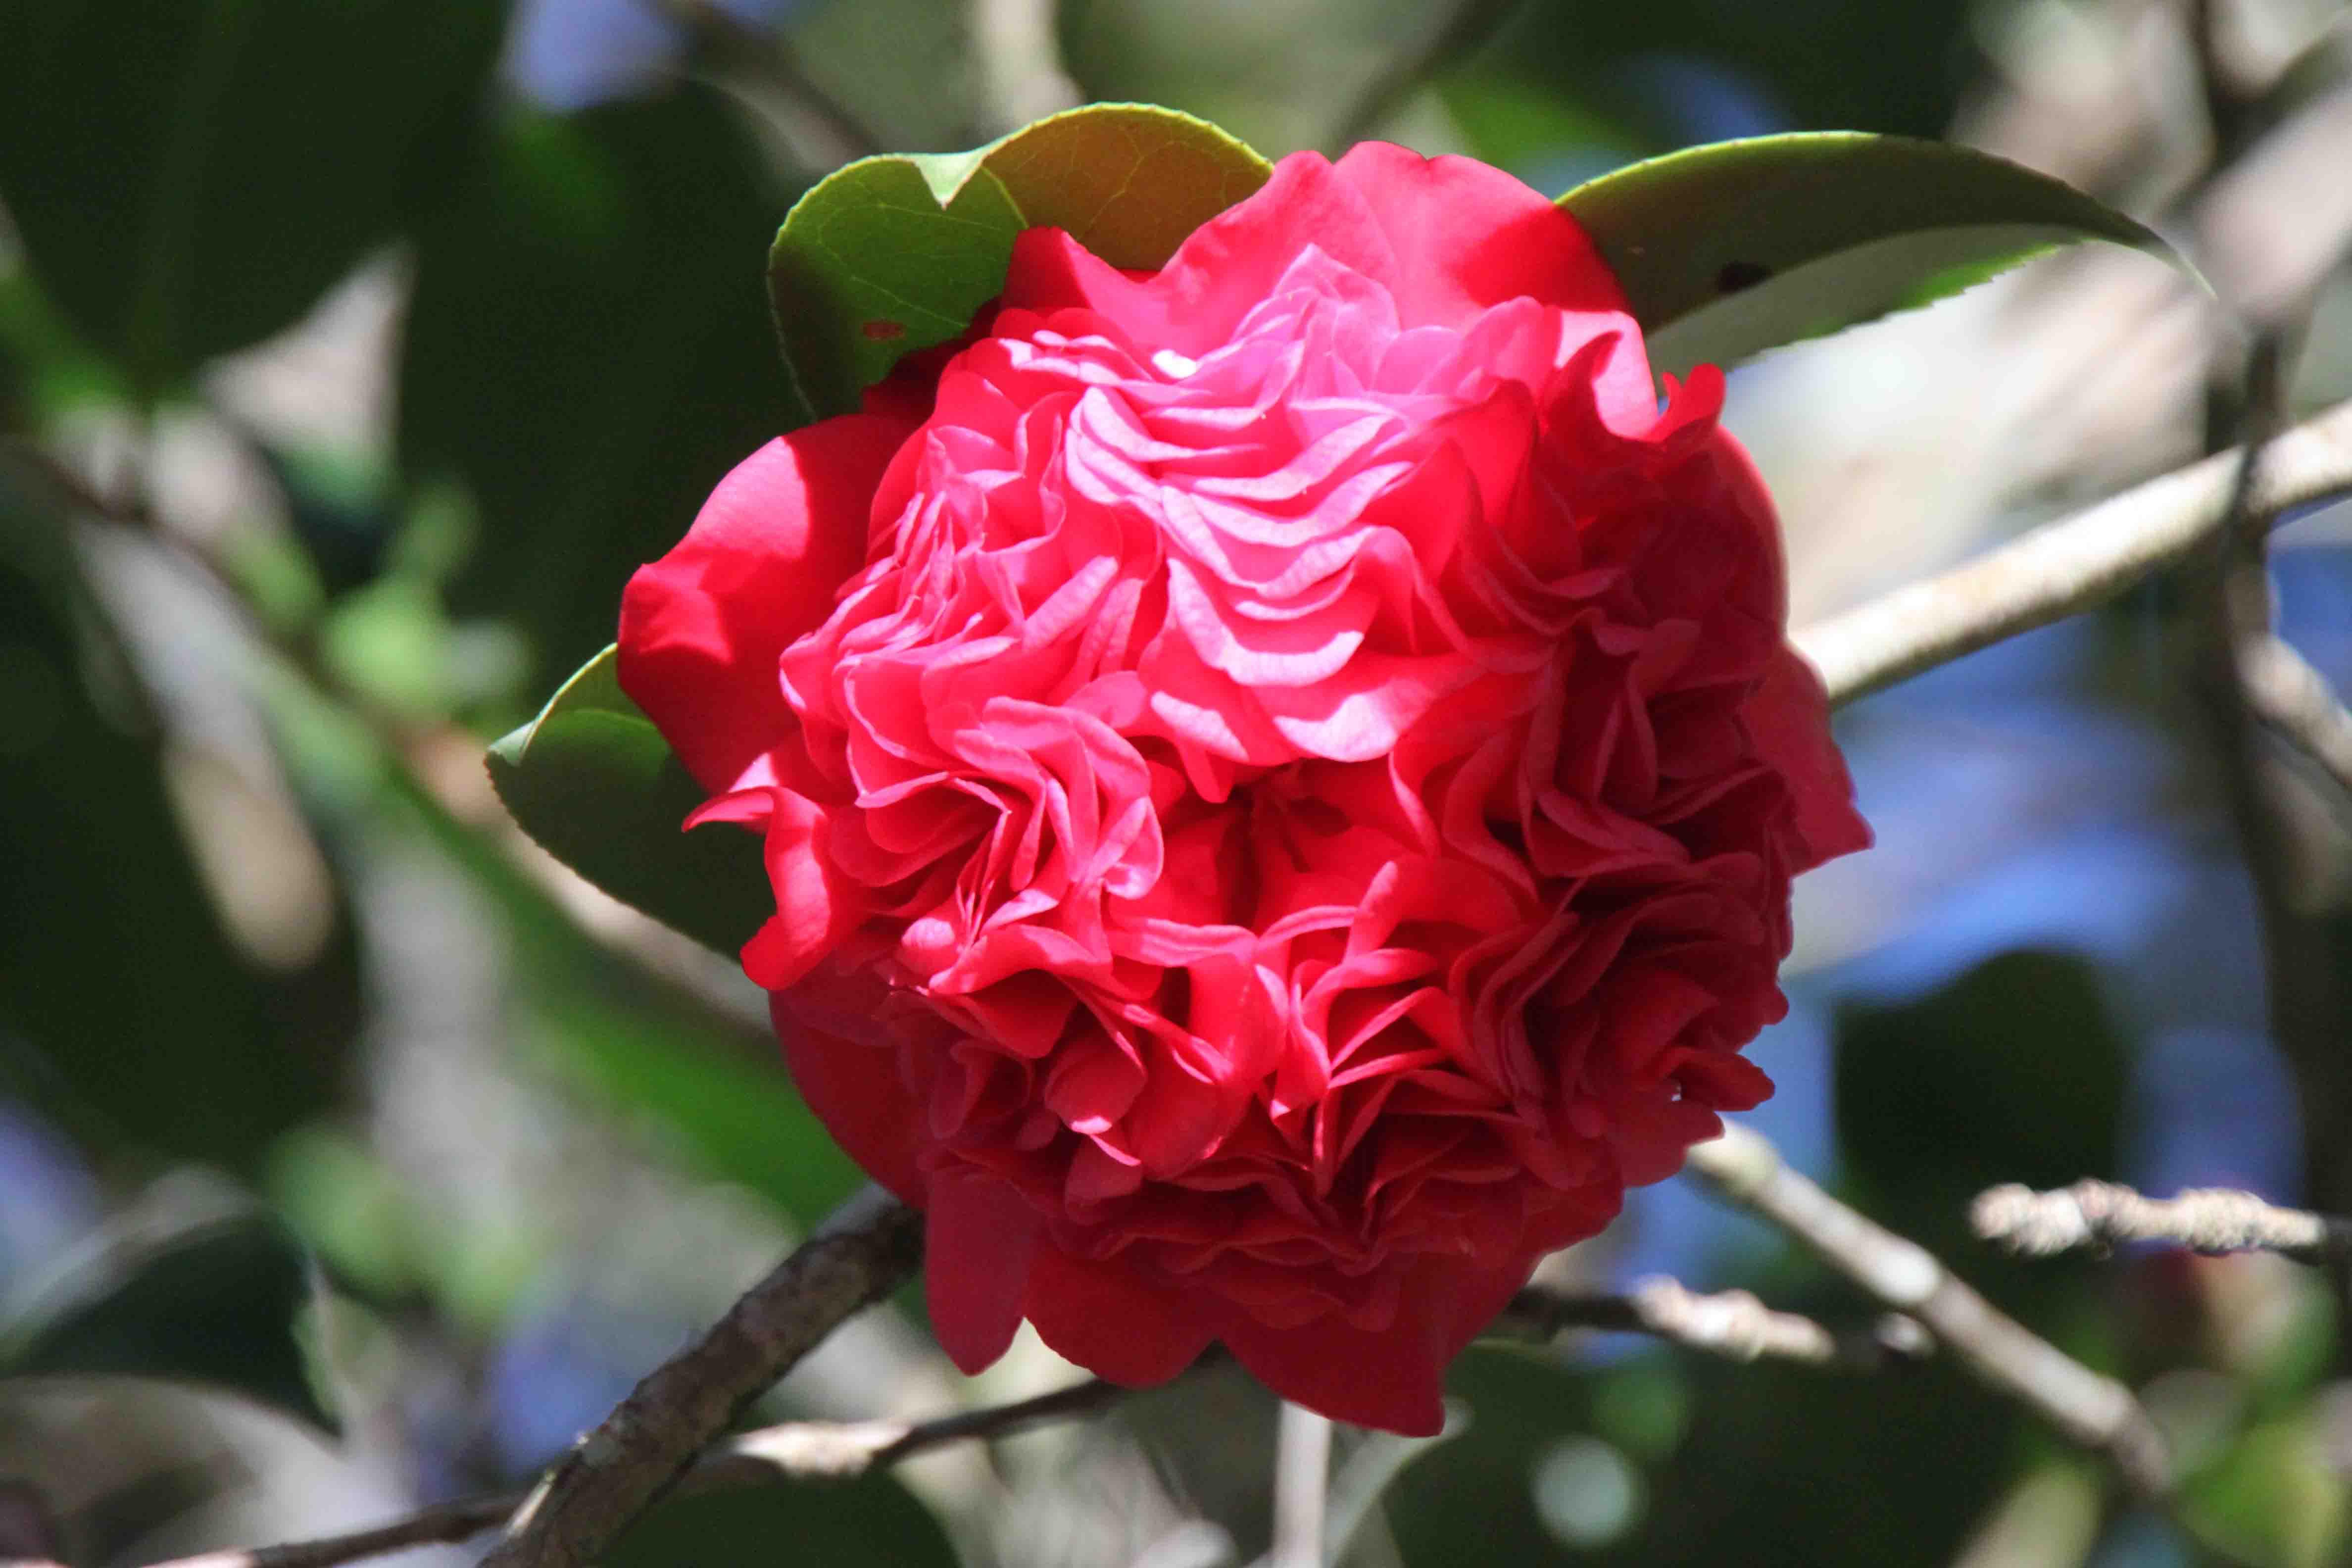 camellia on avery island, louisiana